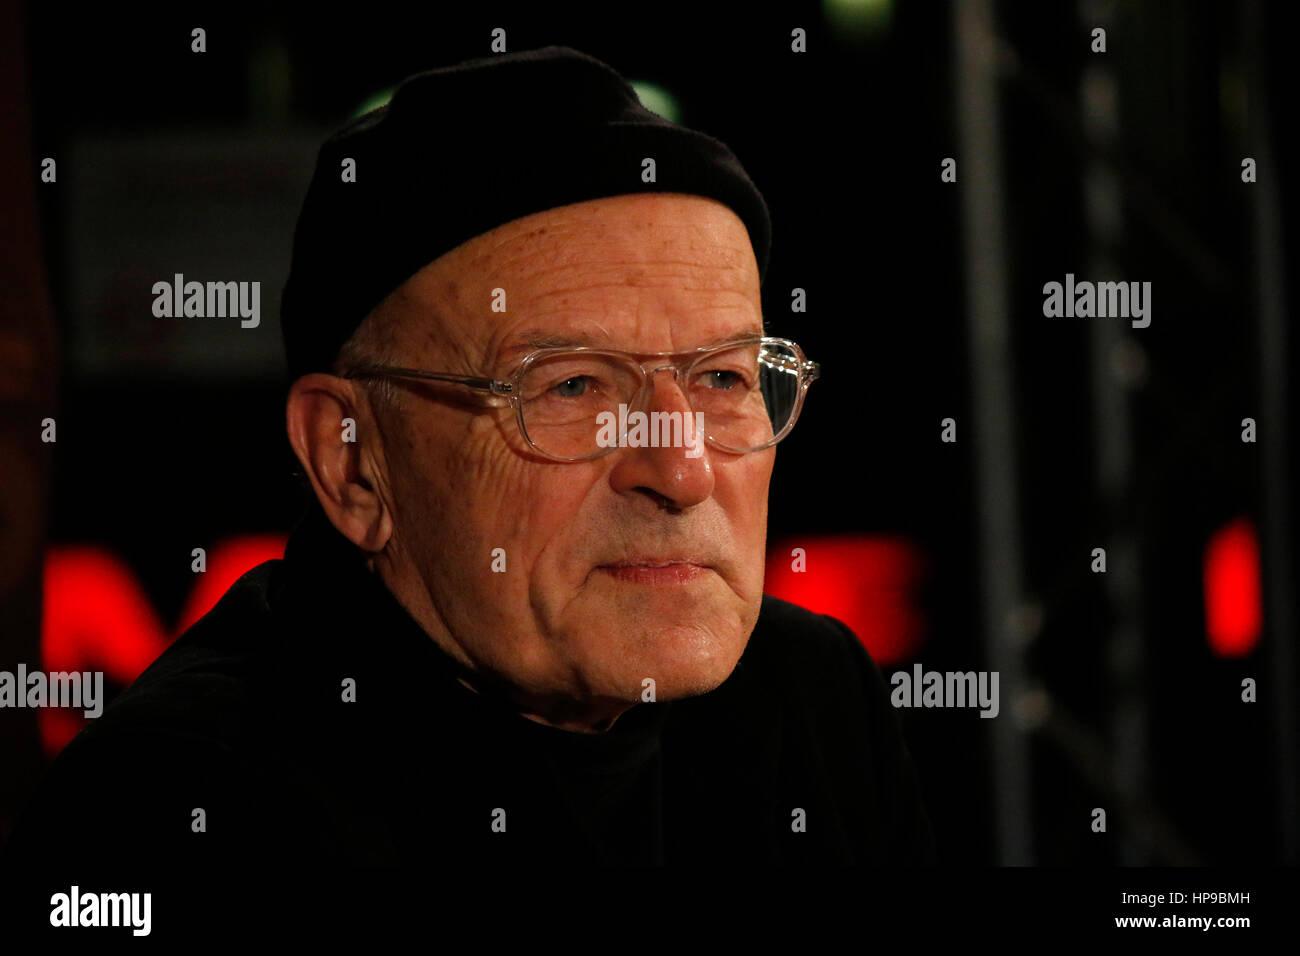 Volker Schloendorff - Radioeins Nighttalk-Berlinale 2017, 16. Februar 2017, Berlin. Stockbild